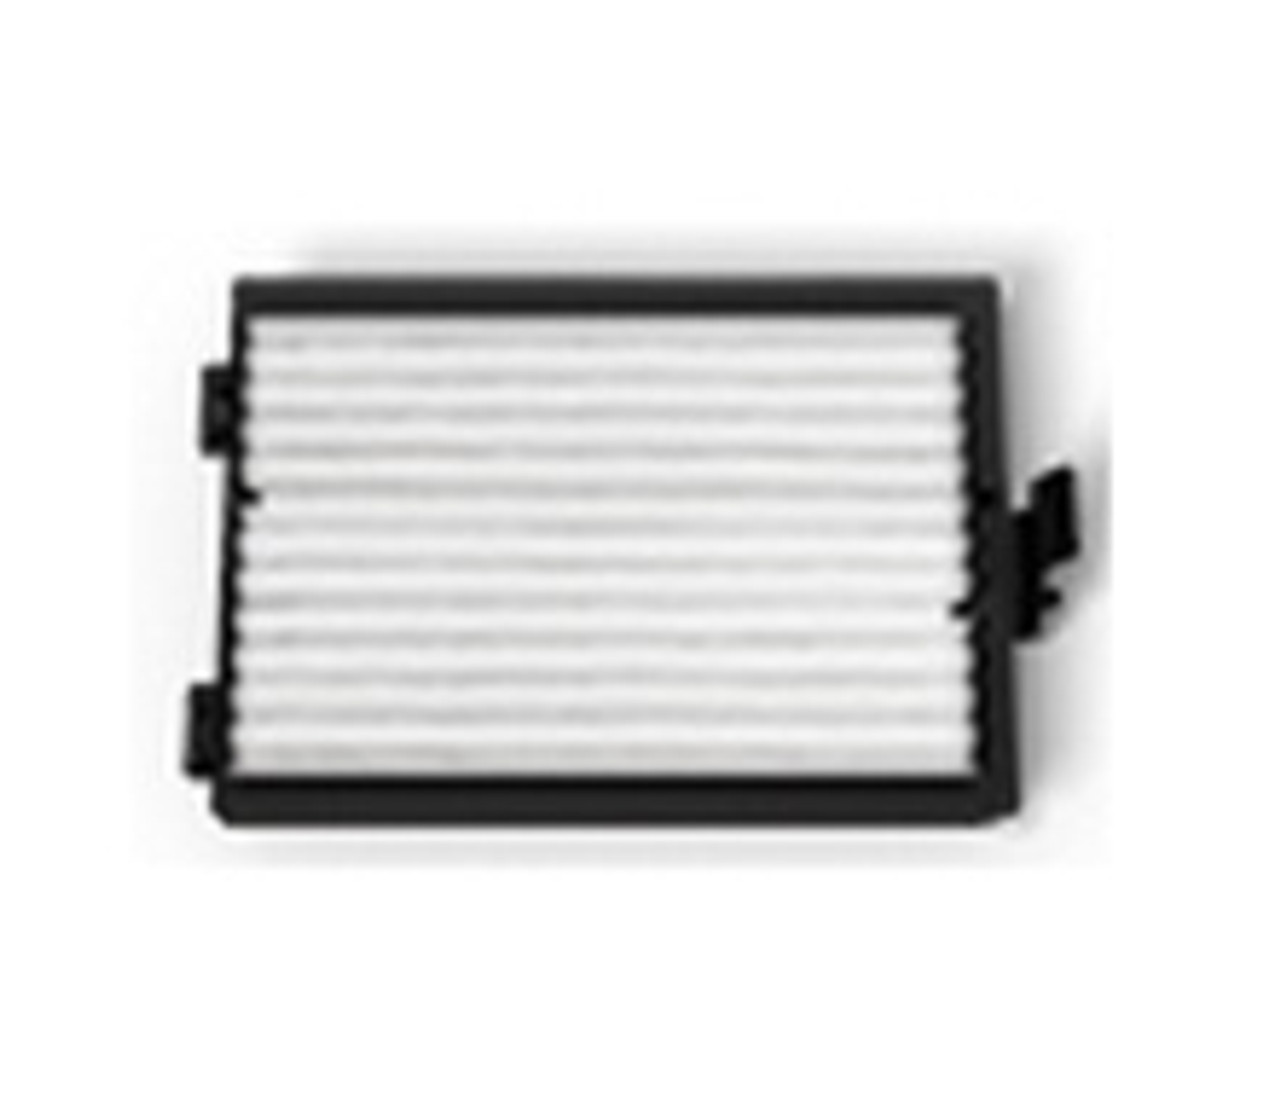 Epson F2000/F2100 Printer Air Filter